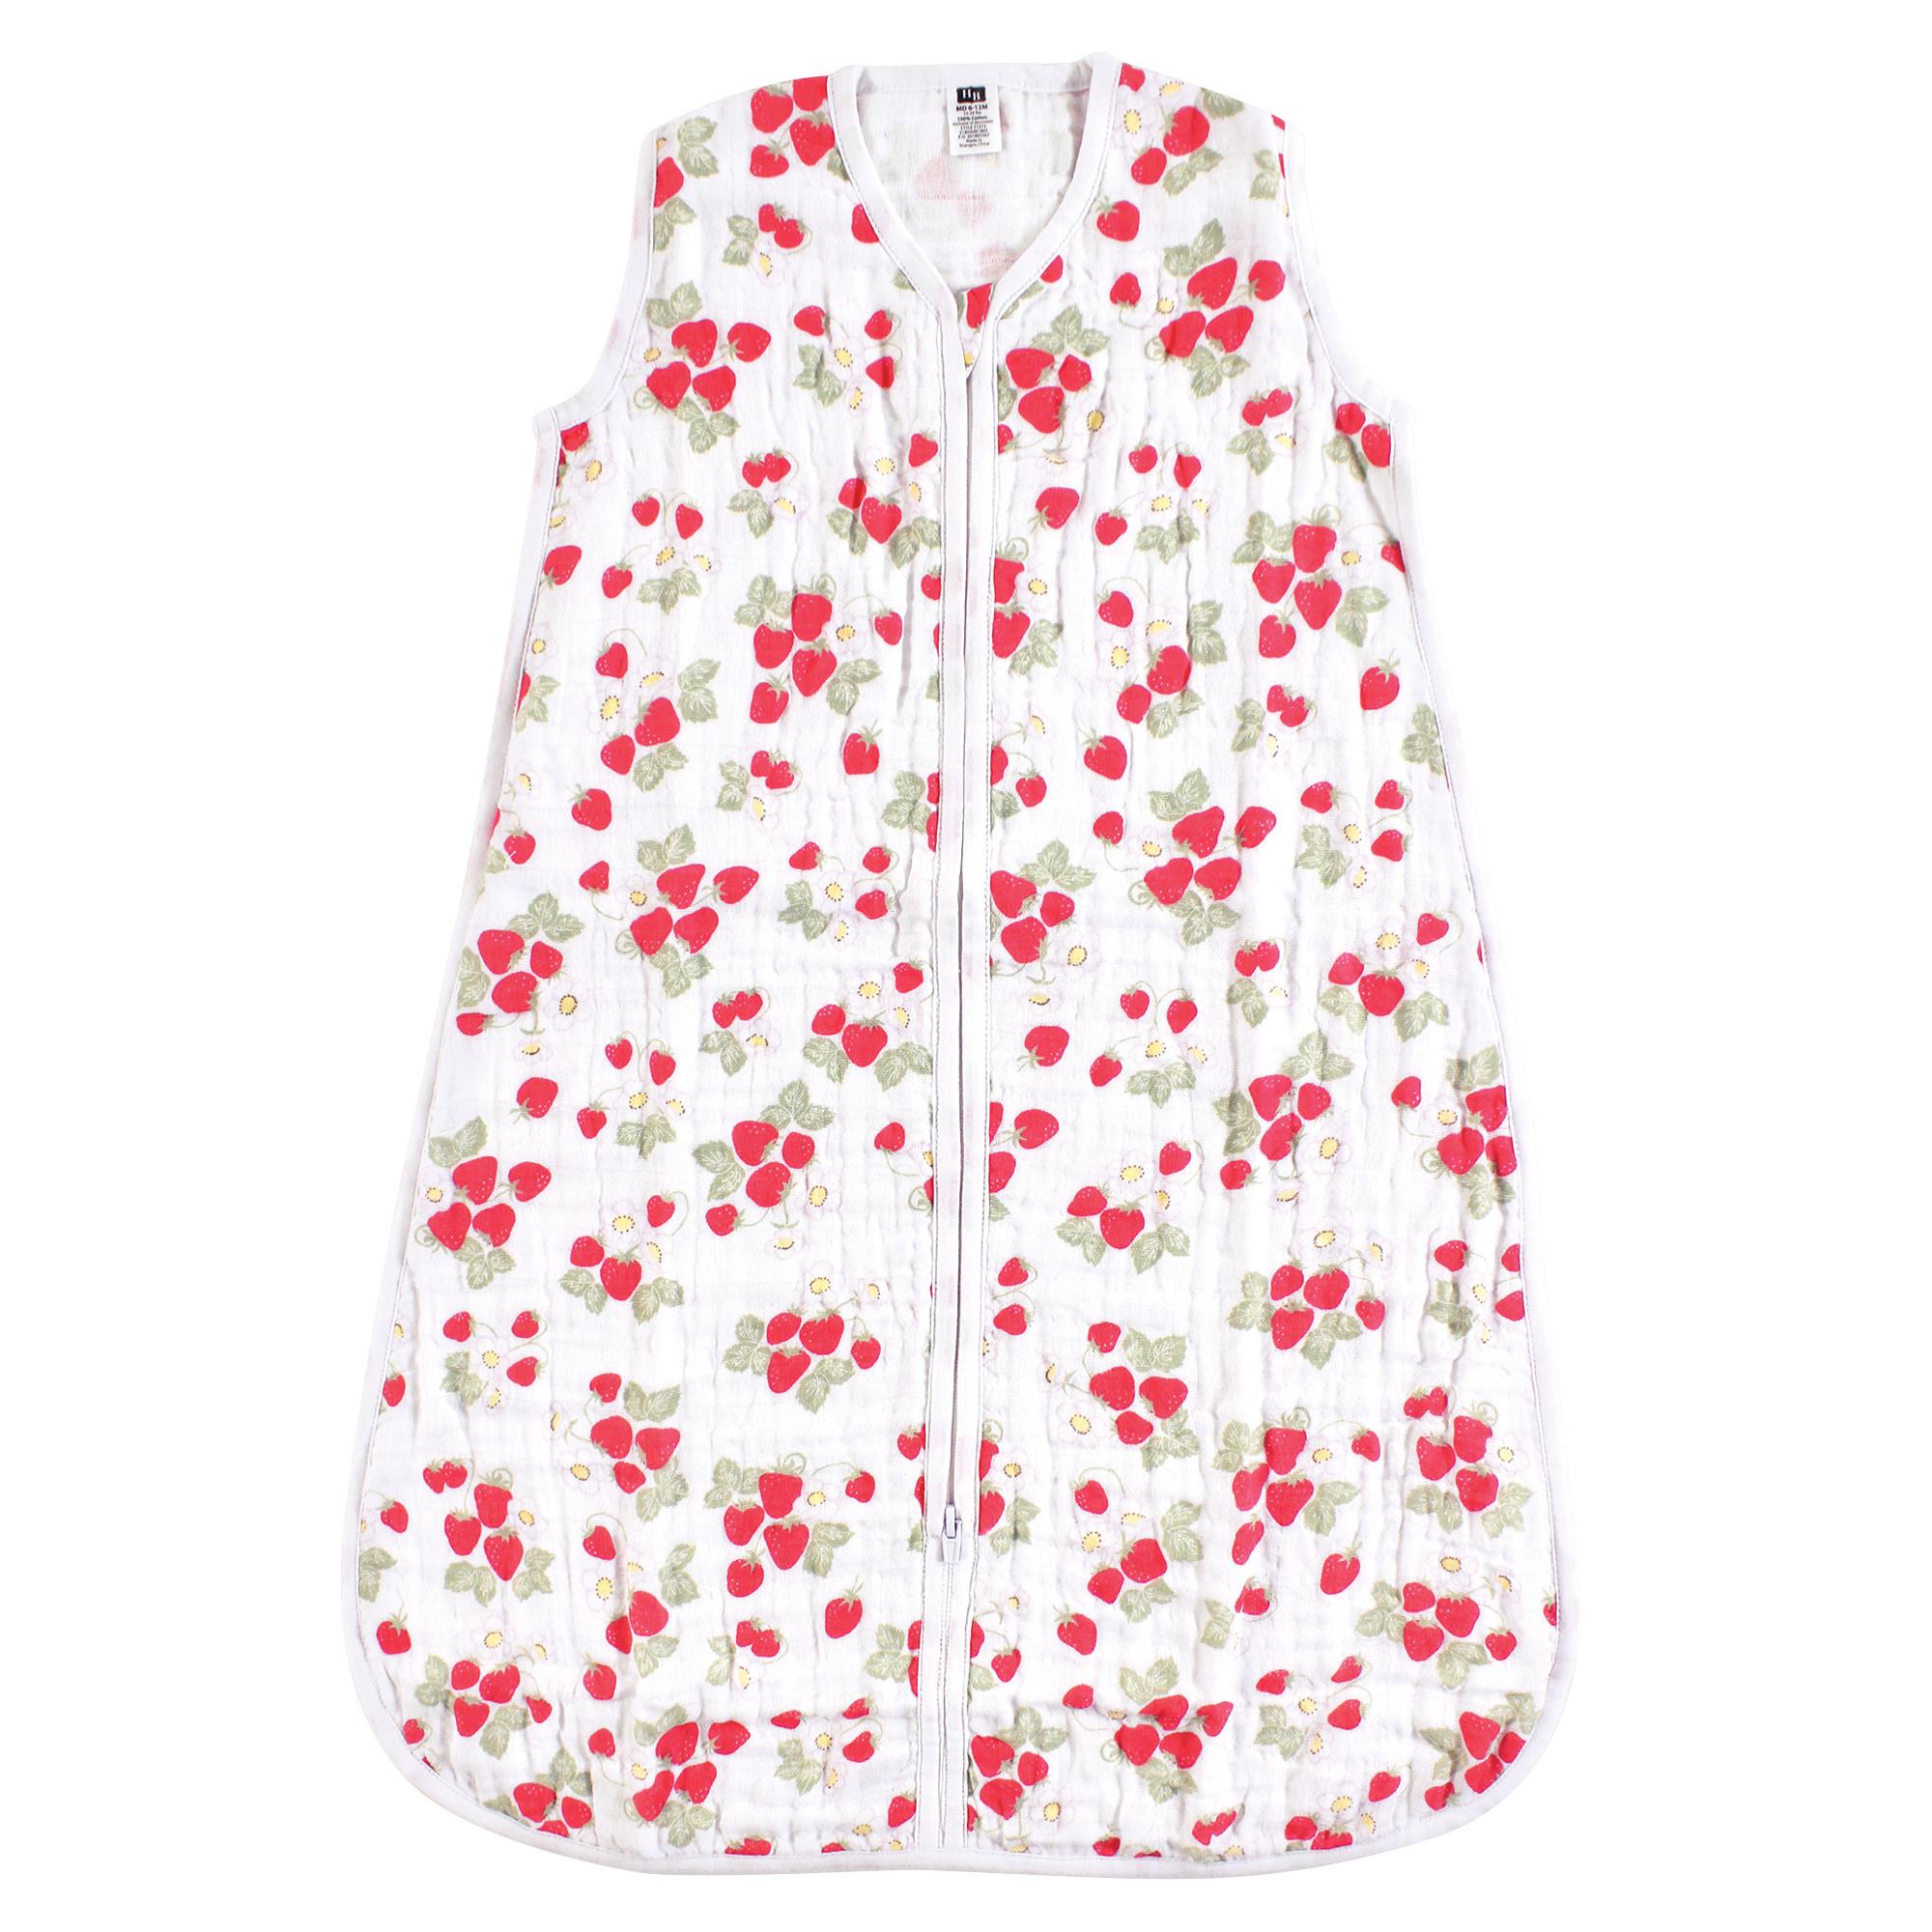 finest selection 6ee15 62491 Hudson Baby - Safe Sleep Wearable Muslin Sleeping Bag ...